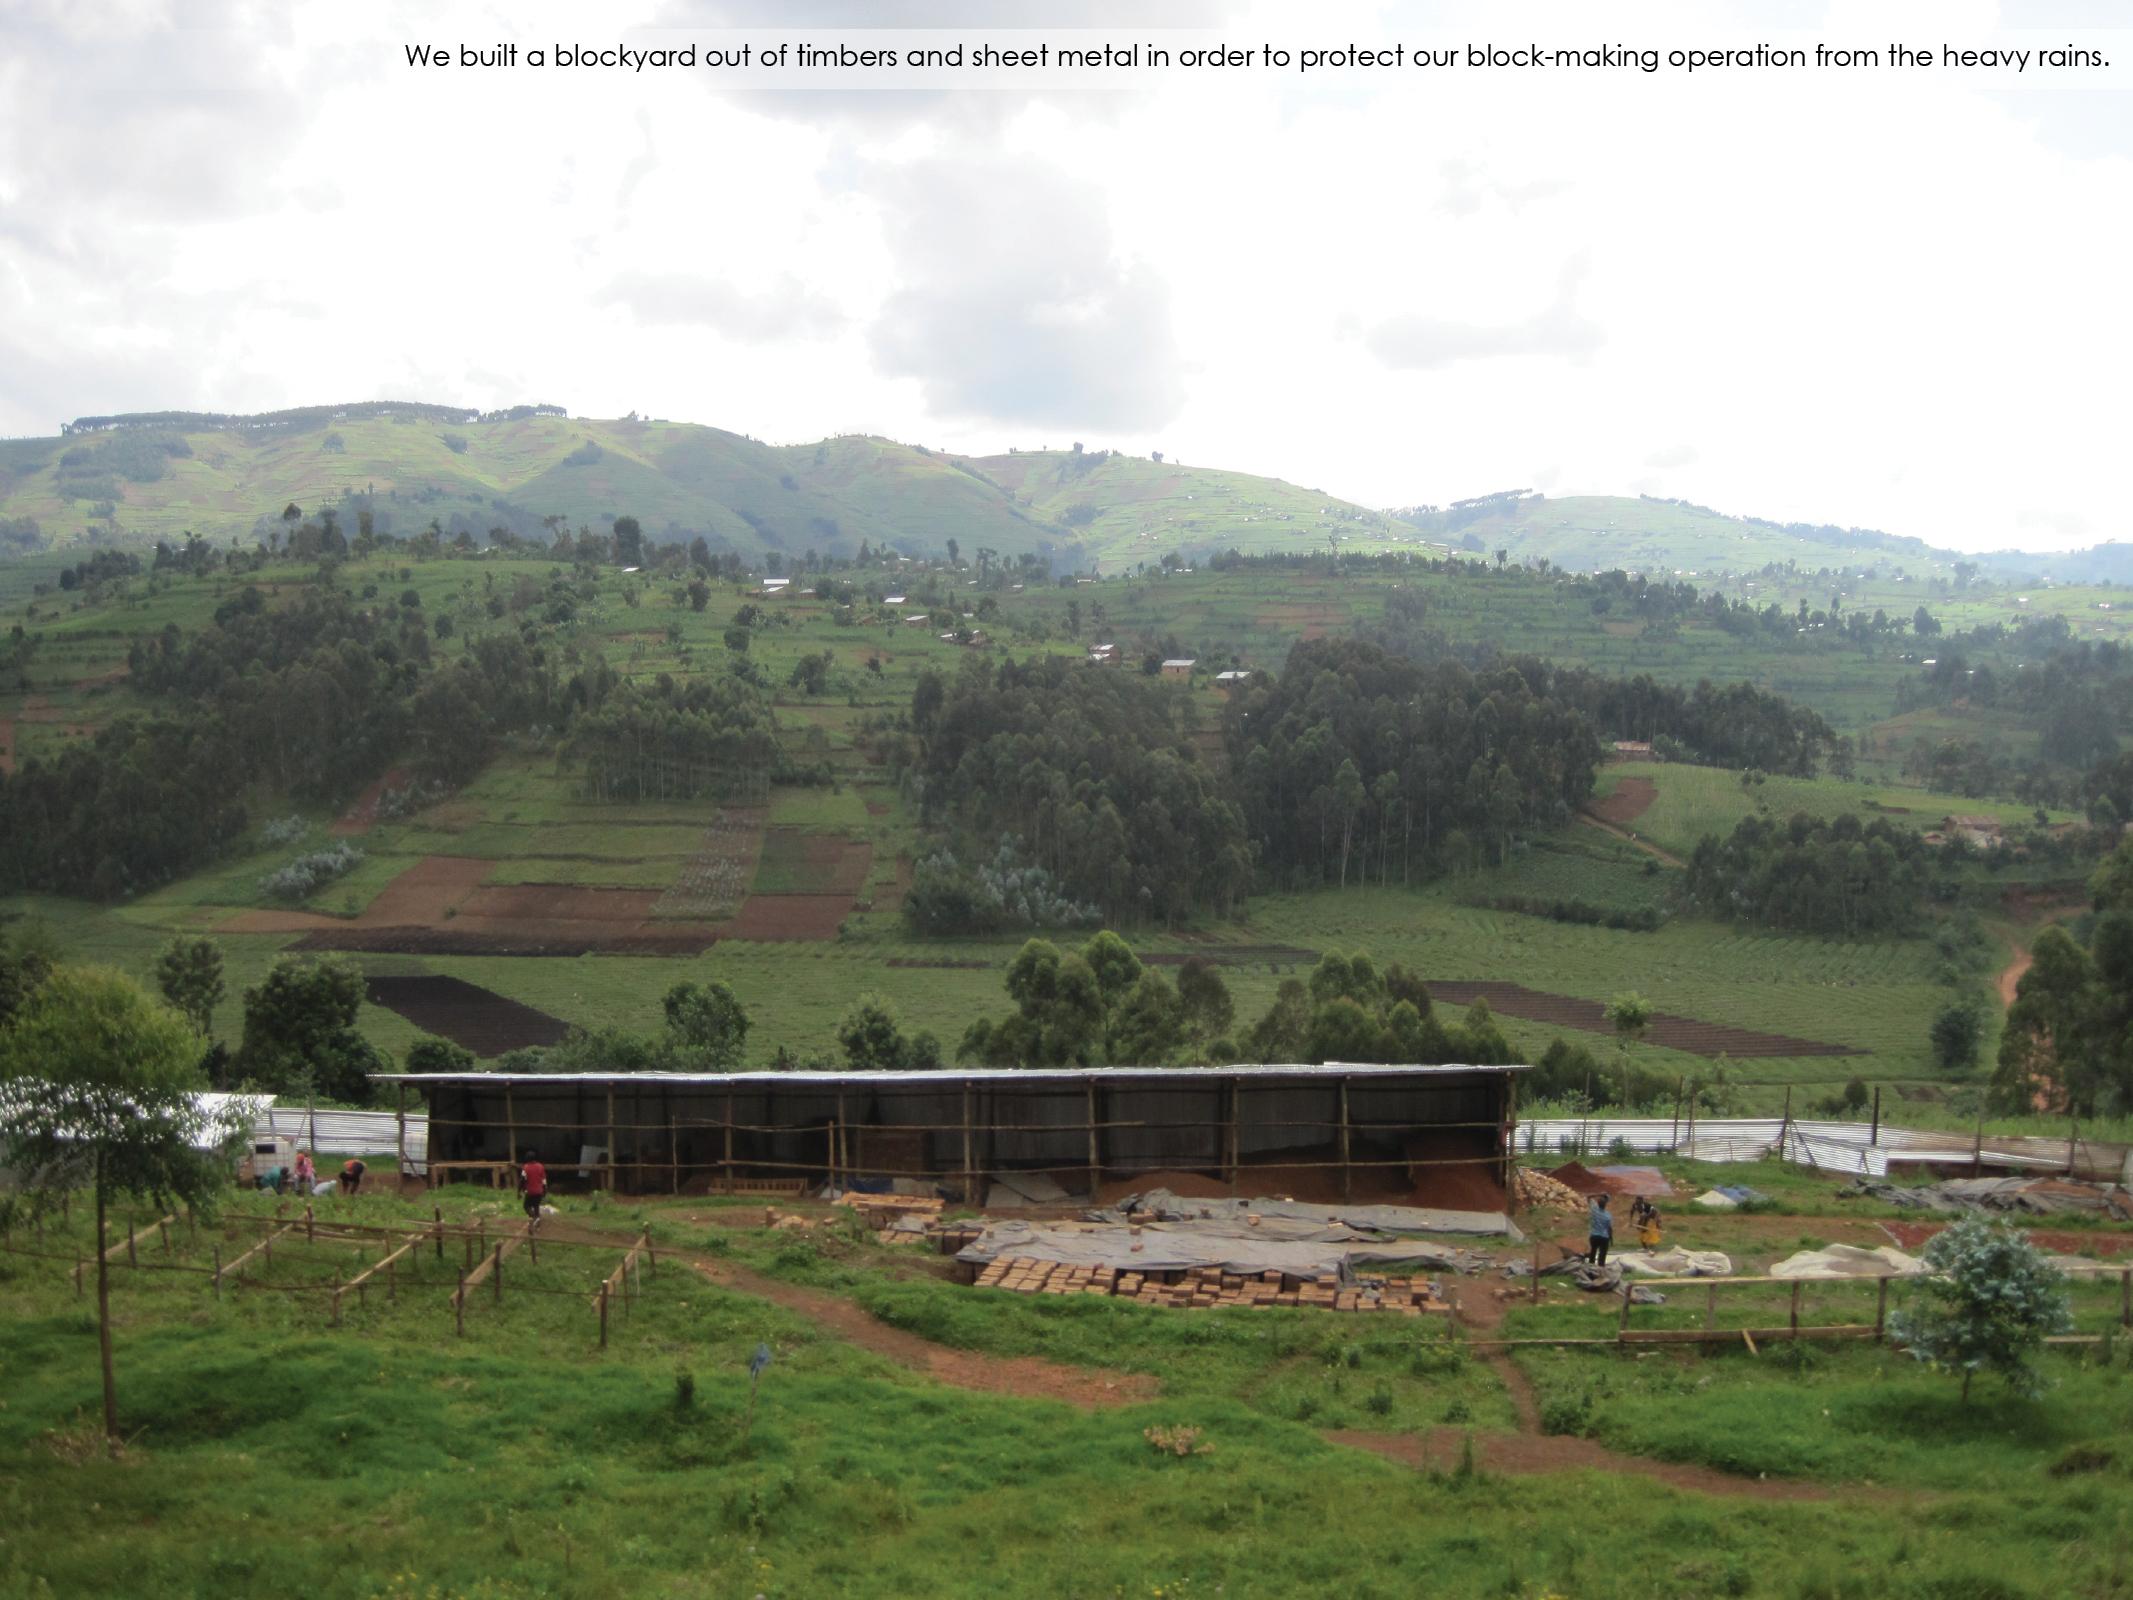 Gaugler_RwandaExperience_p6.jpg